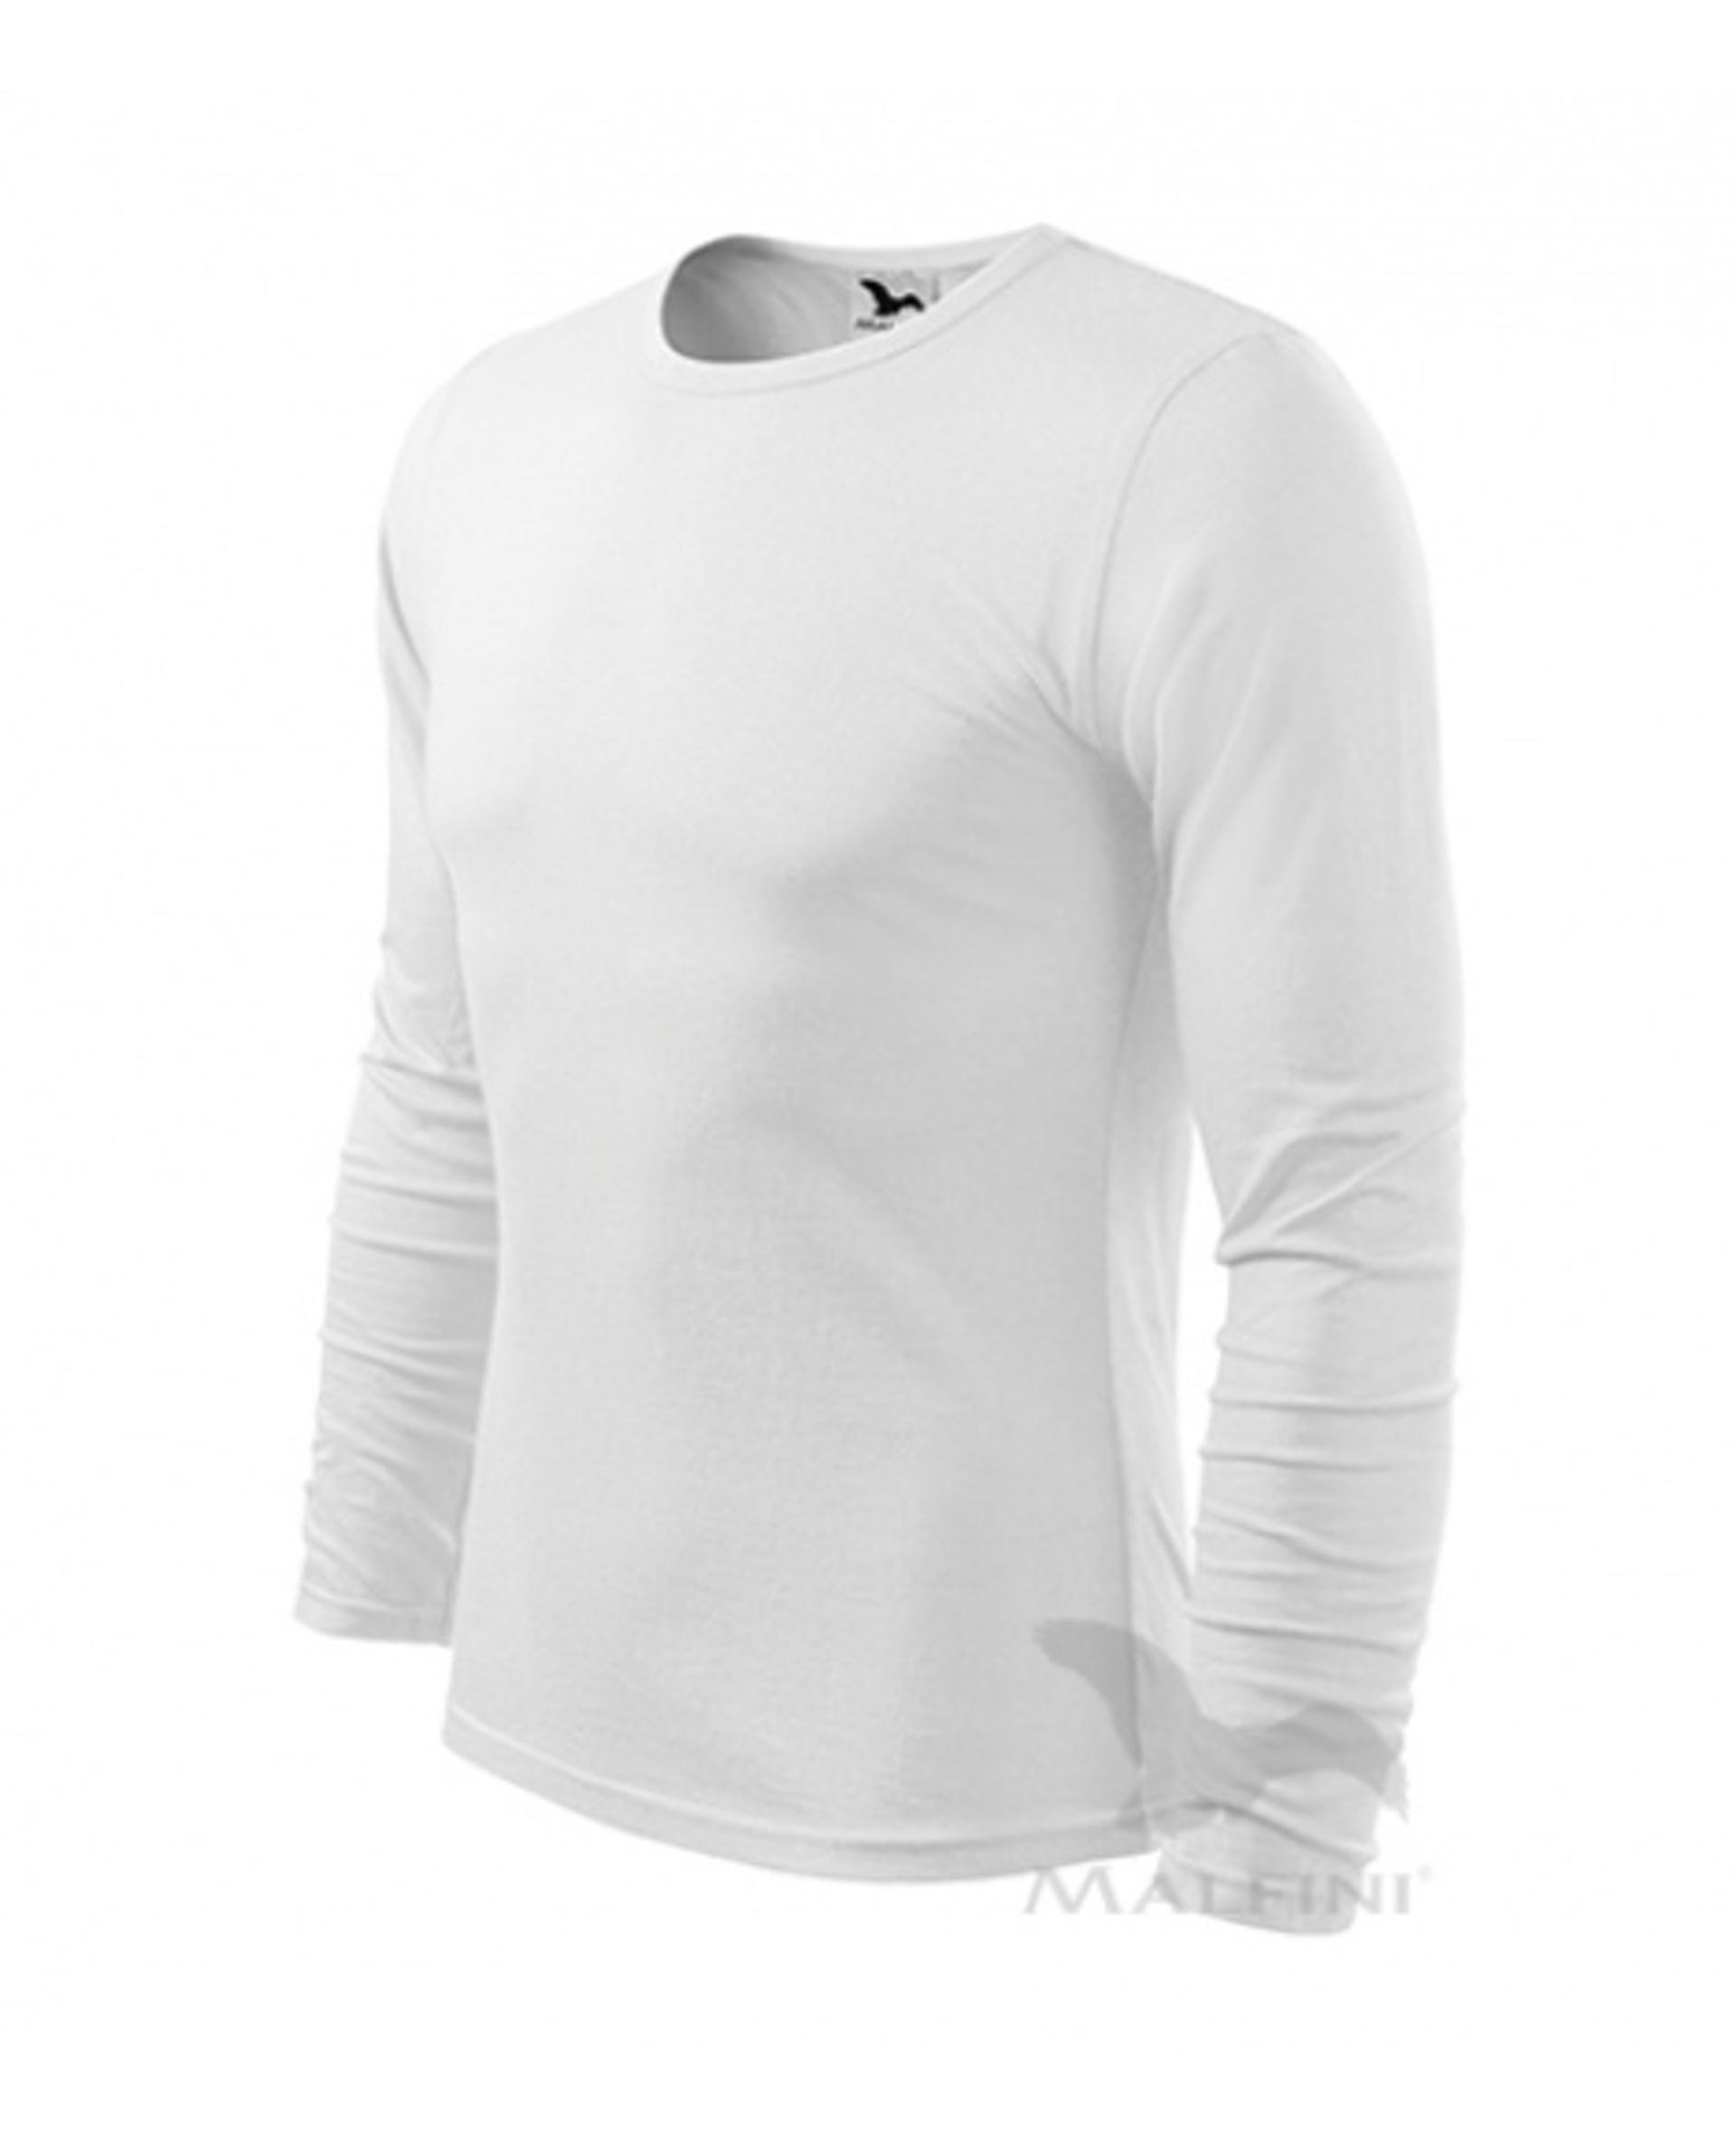 ADLER FIT-T LONG SLEEVE pánské dlouhý rukáv Tričko bílá XXL